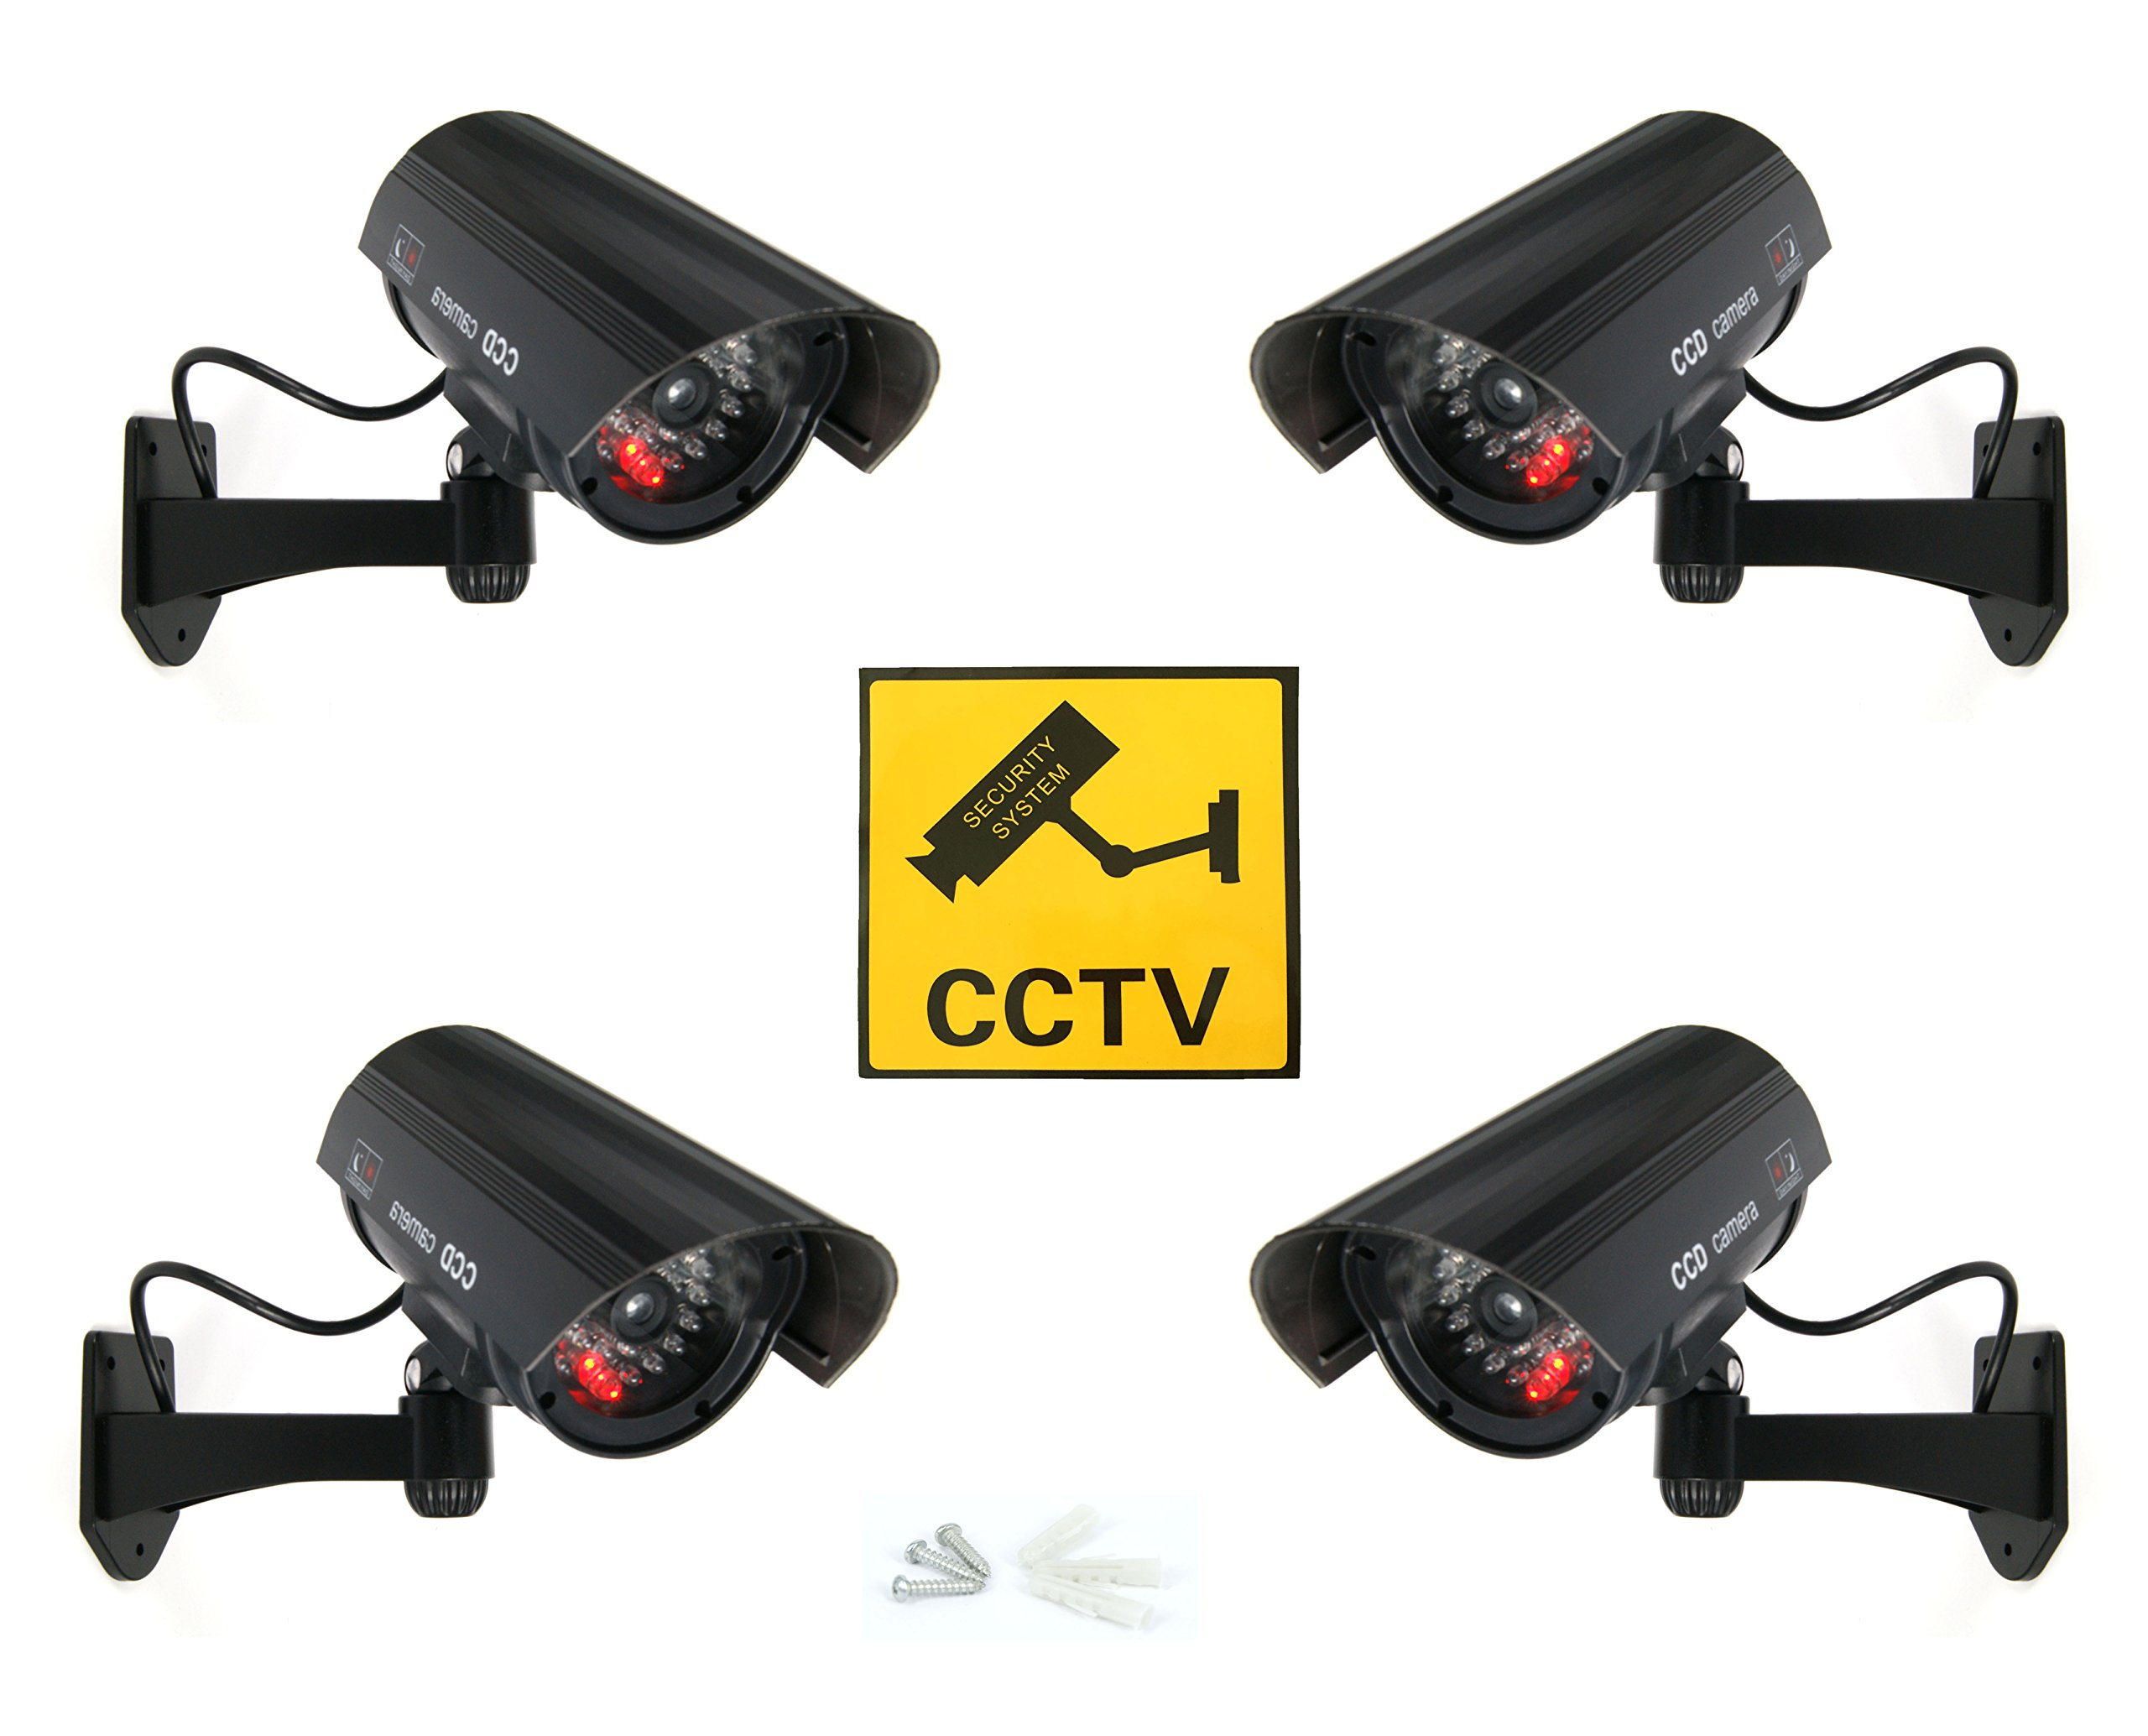 Negra Dummy Fake Cámara Vigilancia Falsa cámara de vídeo con LED rojo, 4x Dummy Kamera product image